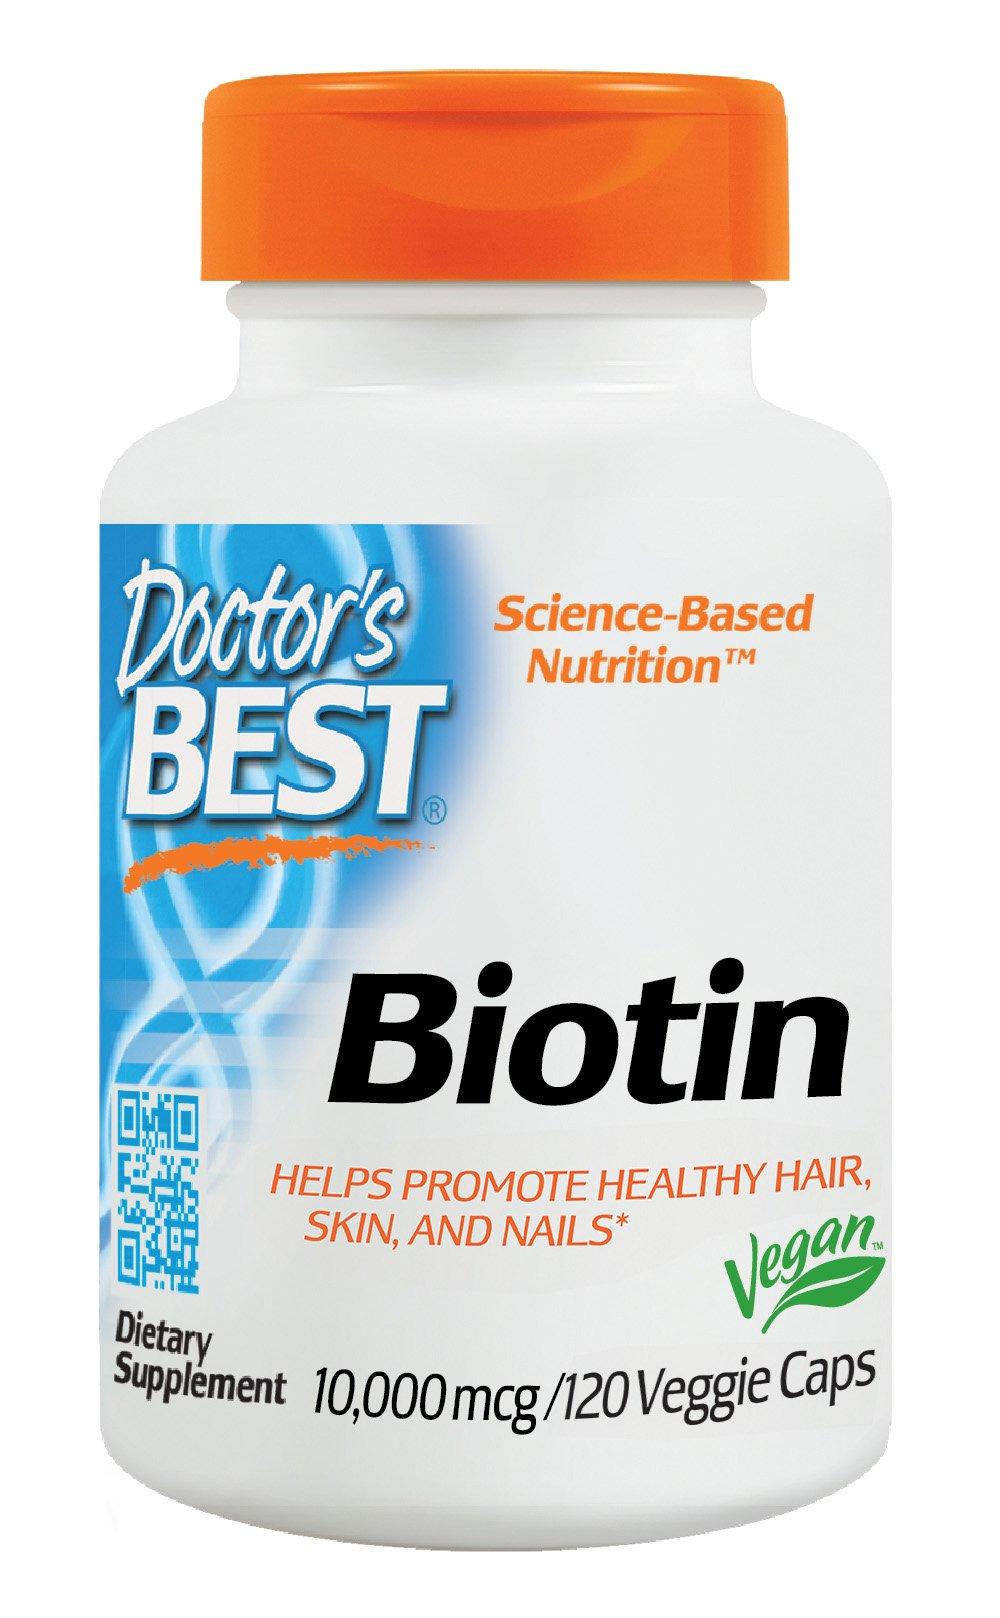 Doctor's Best Biotin, Non-GMO, Vegan, Gluten Free, Supports Hair, Skin, Nails, 10,000 mcg, 120 Veggie Caps